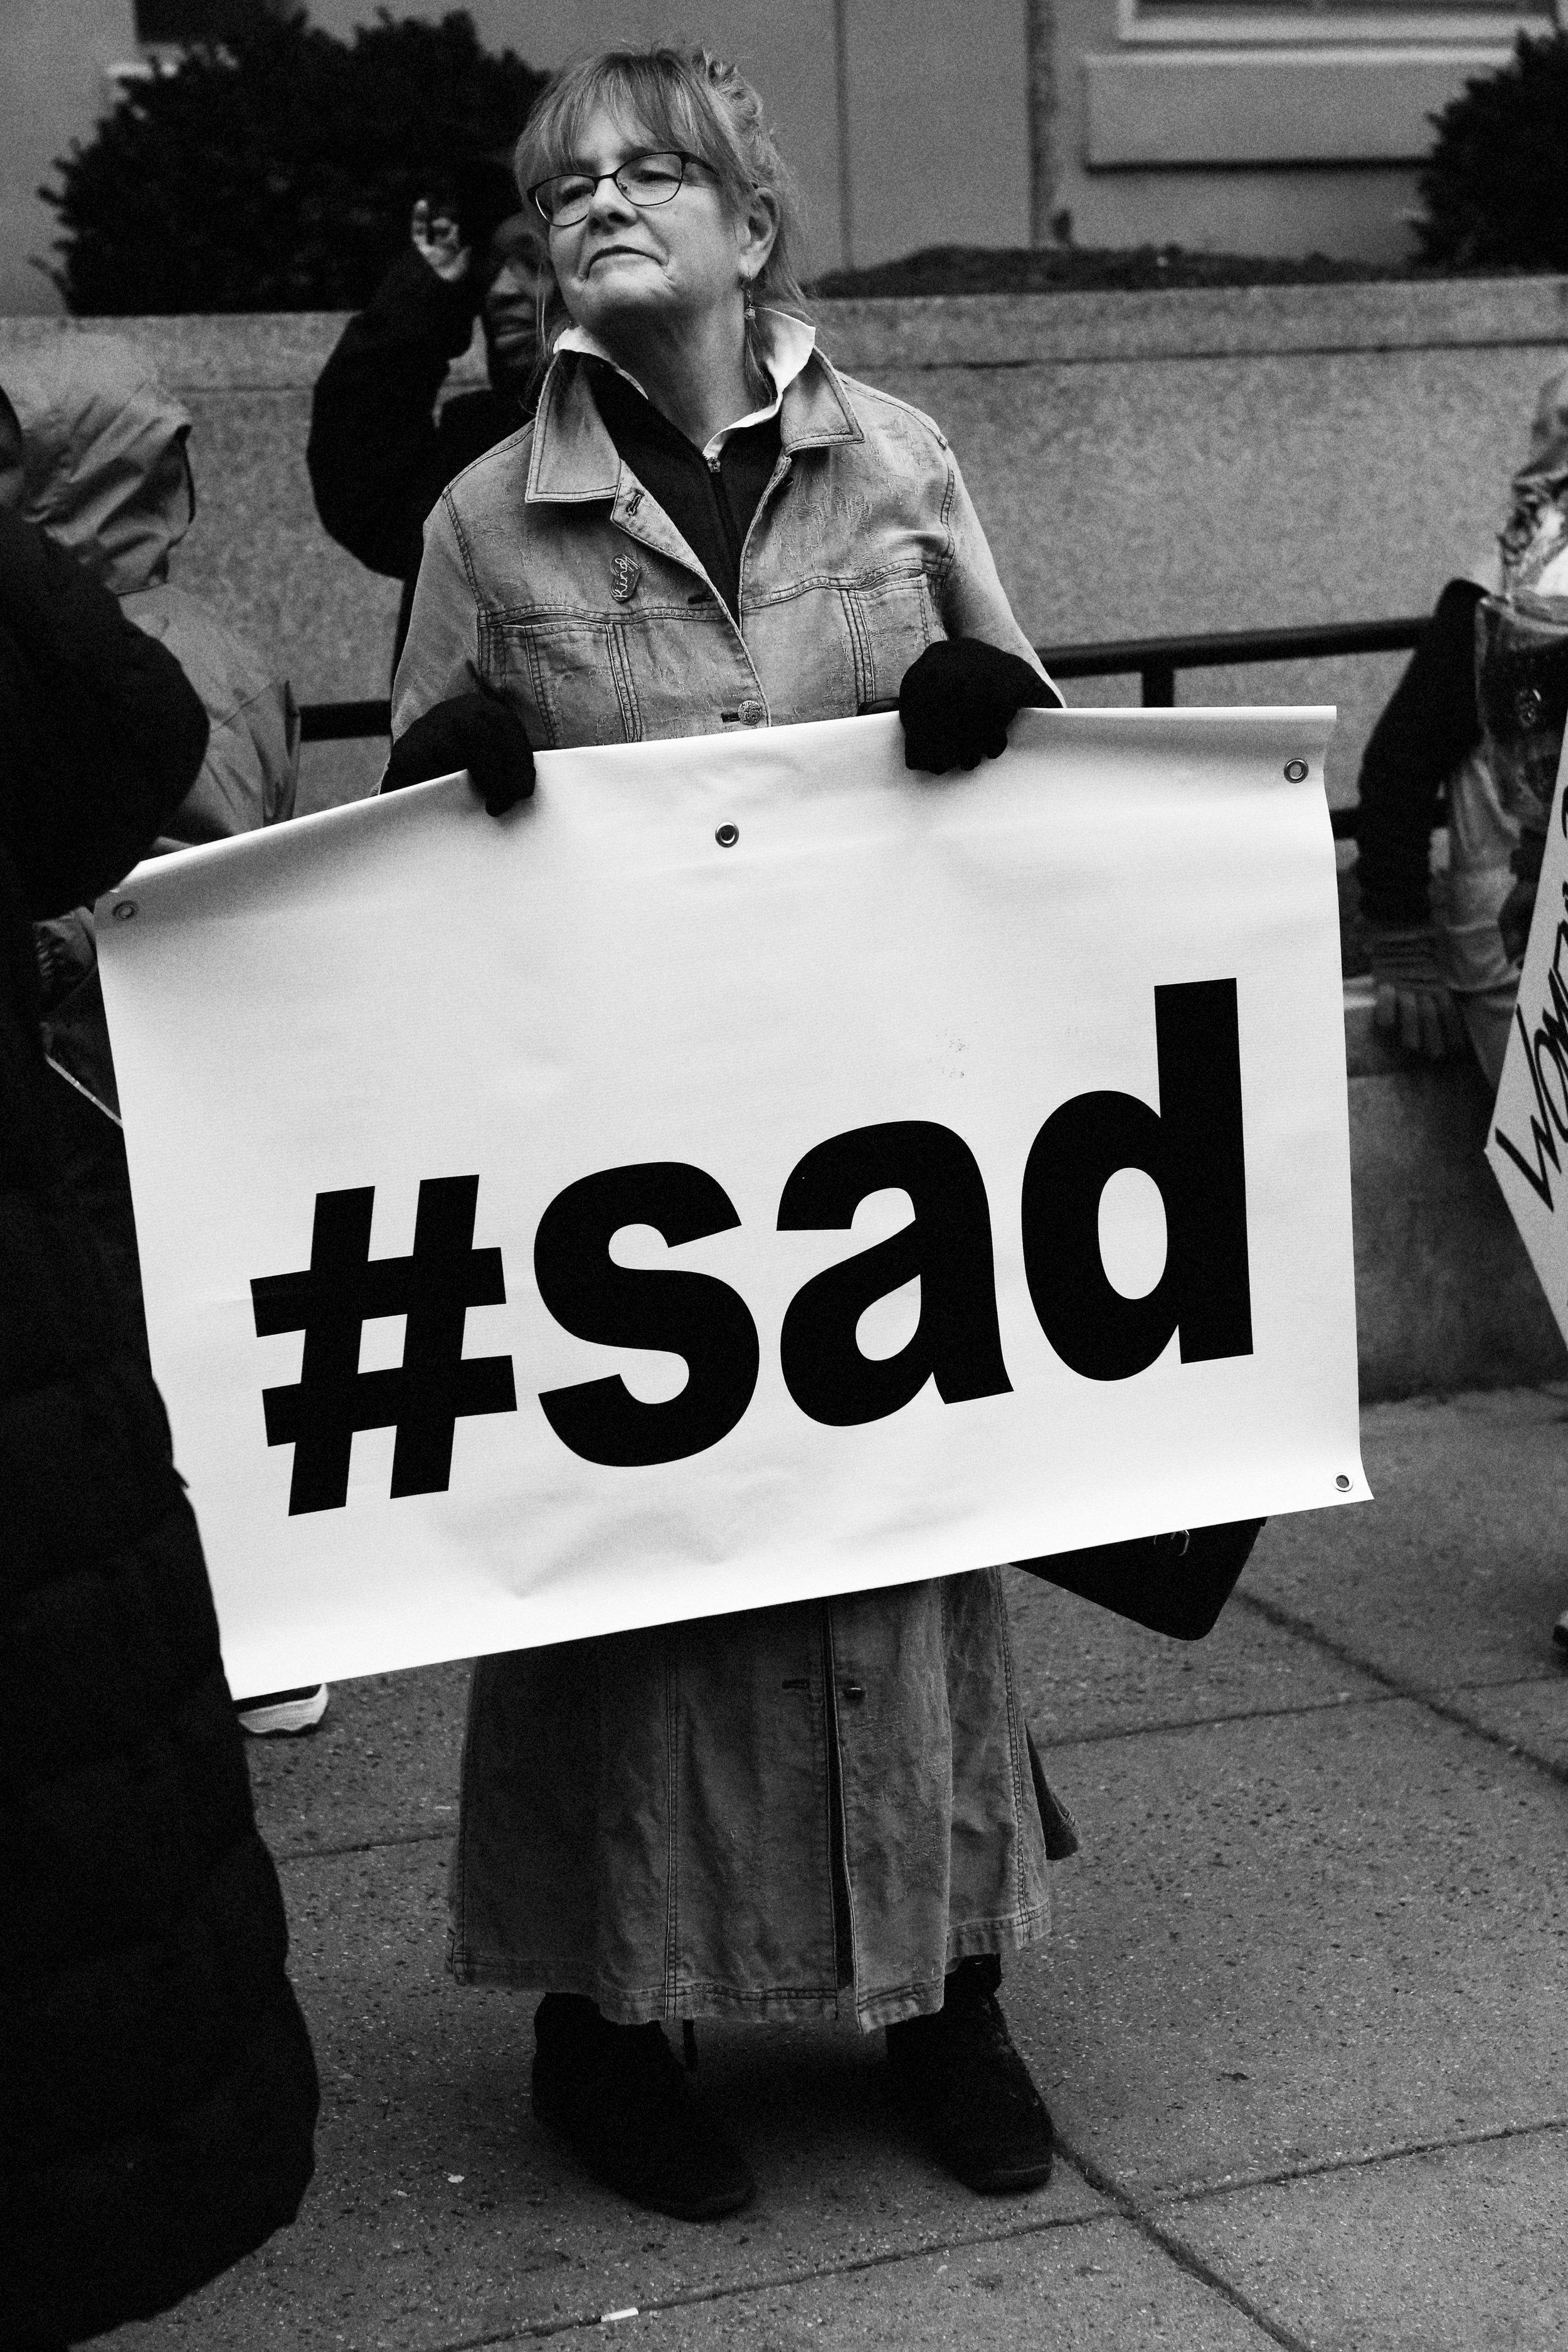 WOMEN'S MARCH ON WASHINGTON PROTEST SIGNS SKYE PARROTT